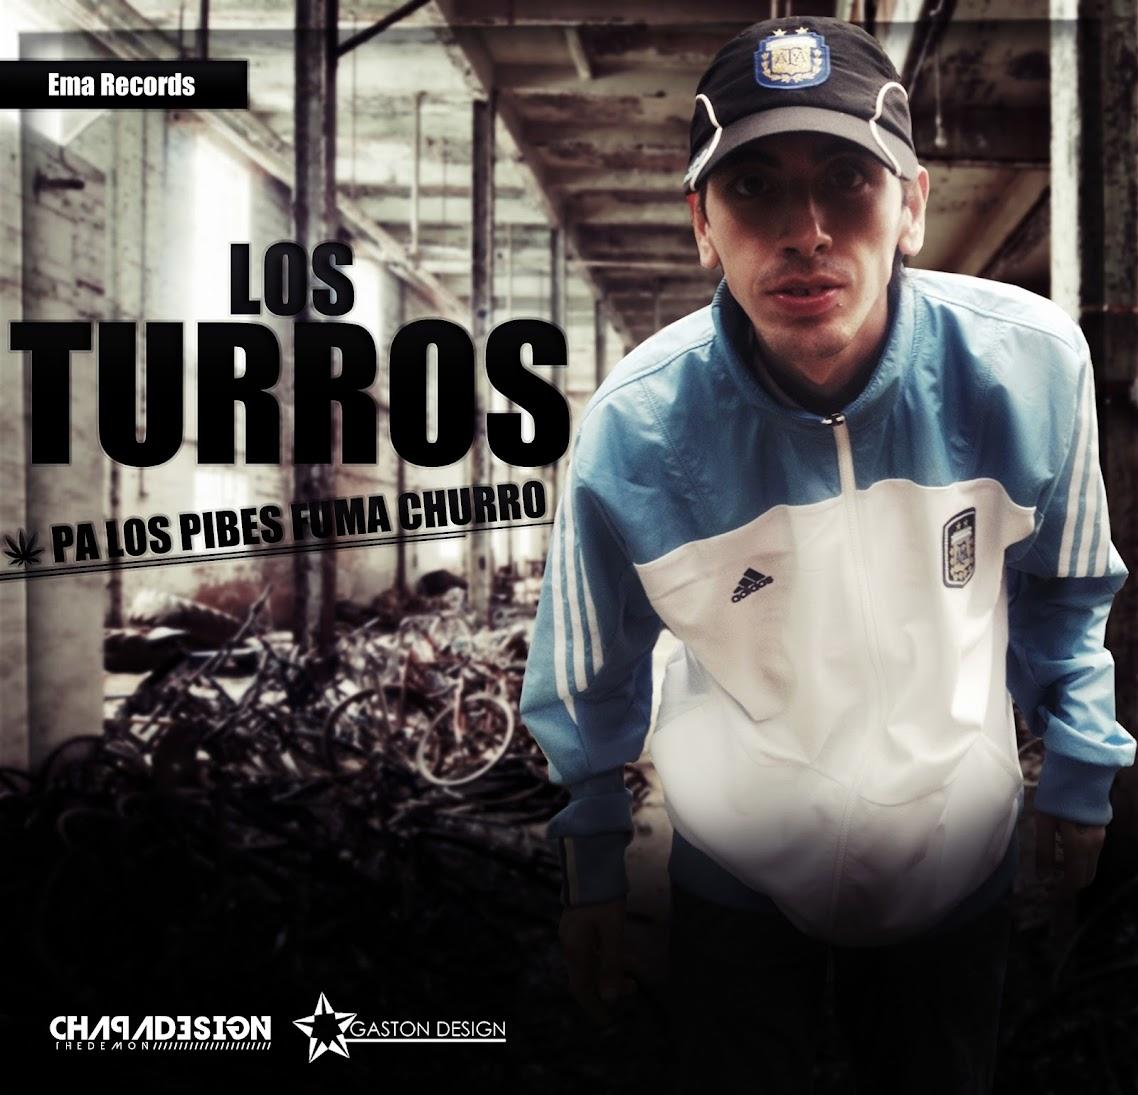 http://1.bp.blogspot.com/-UCslOge5fUs/UL0CNJjKLrI/AAAAAAAABWA/TuuZVQeAhBY/s1138/Los+Turros+-+Ft+GastonDesign.jpg